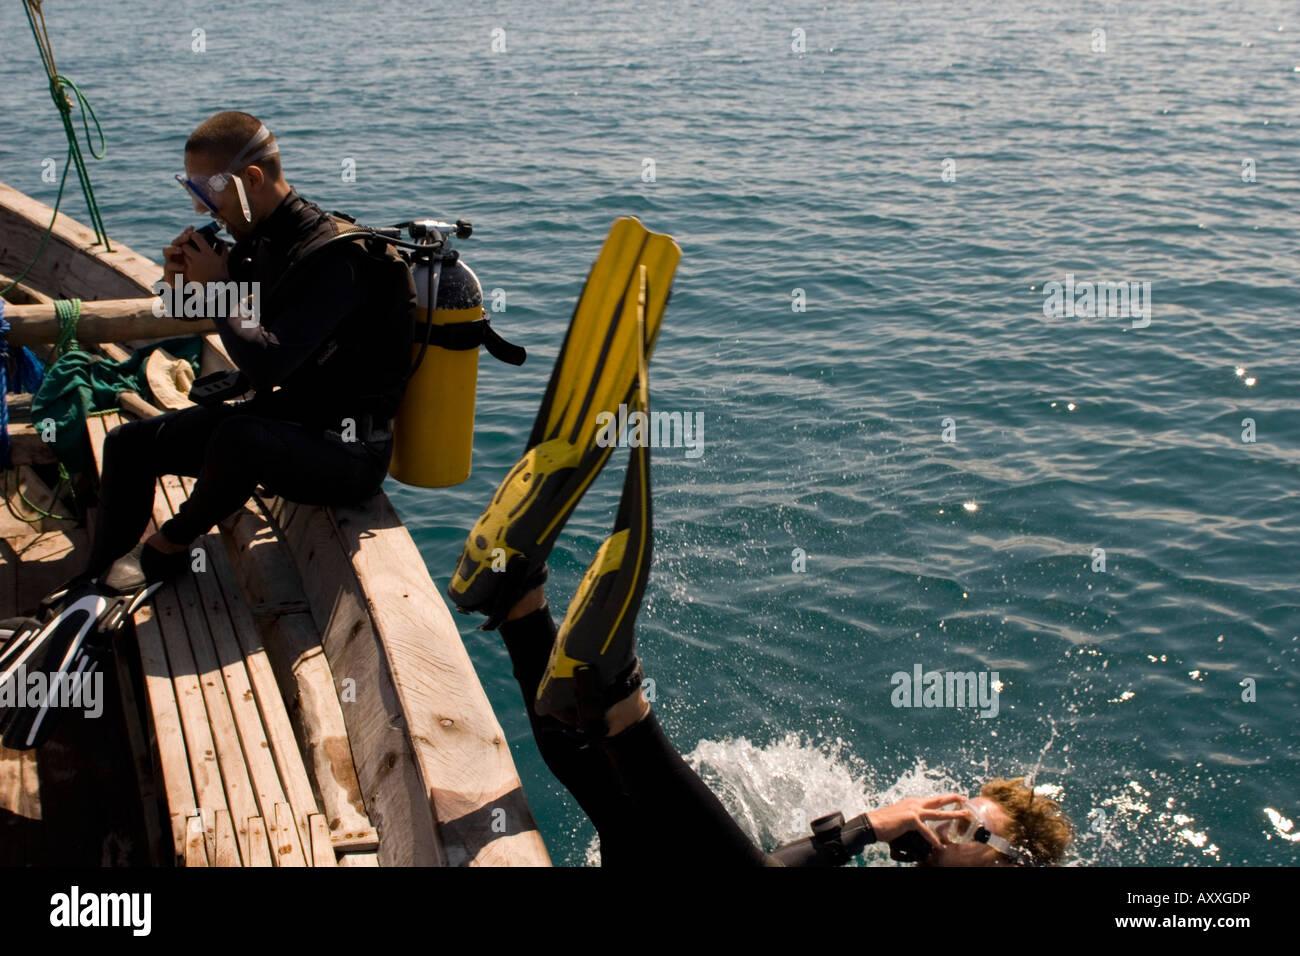 Scuba divers entering water from boat Chole Bay off Mafia Island Tanzania - Stock Image